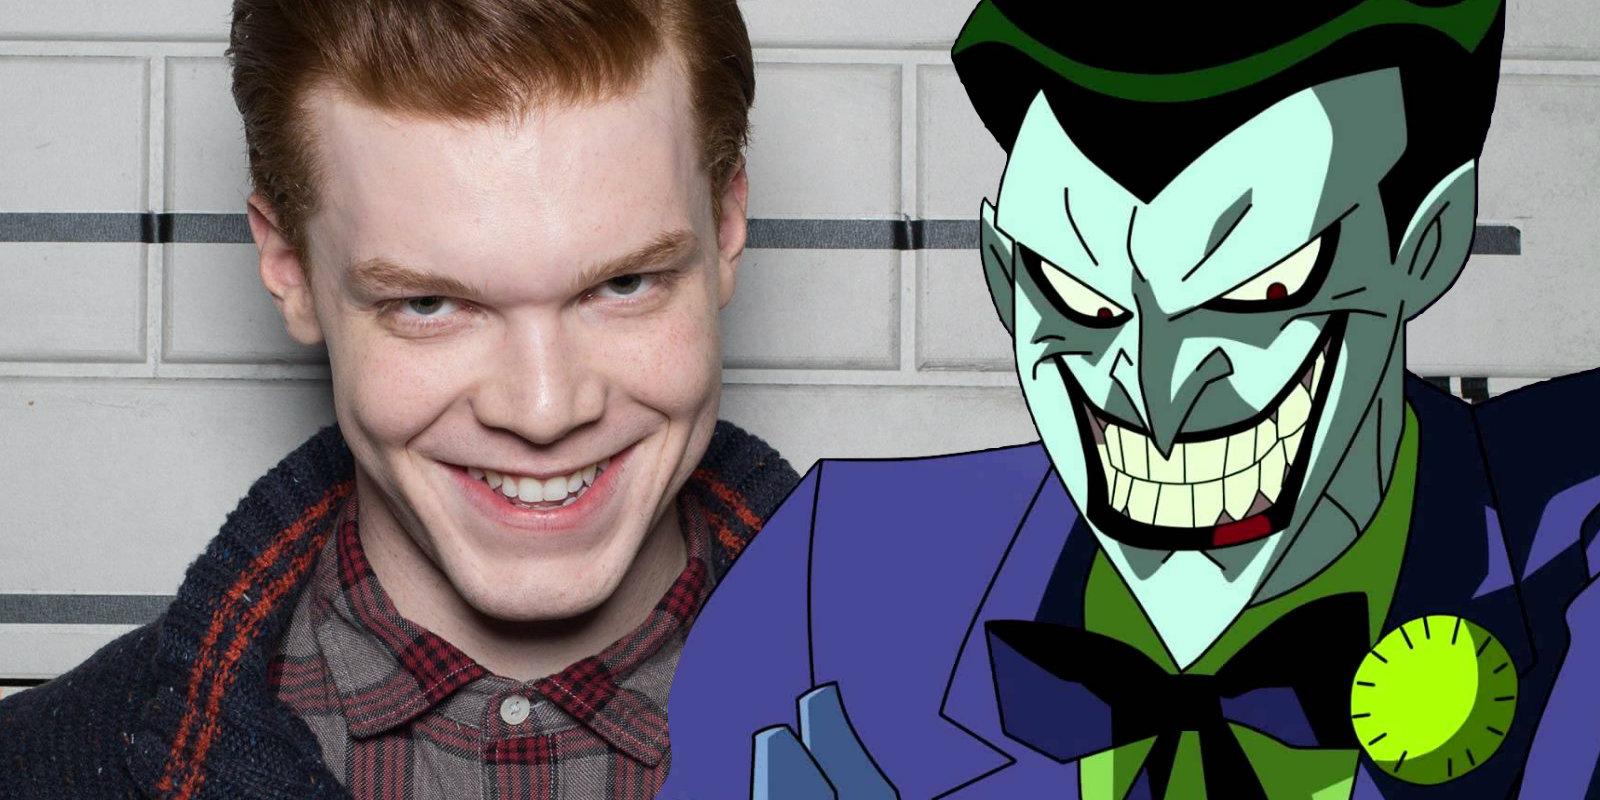 Gotham - Jerome inspired by Mark Hamill Joker